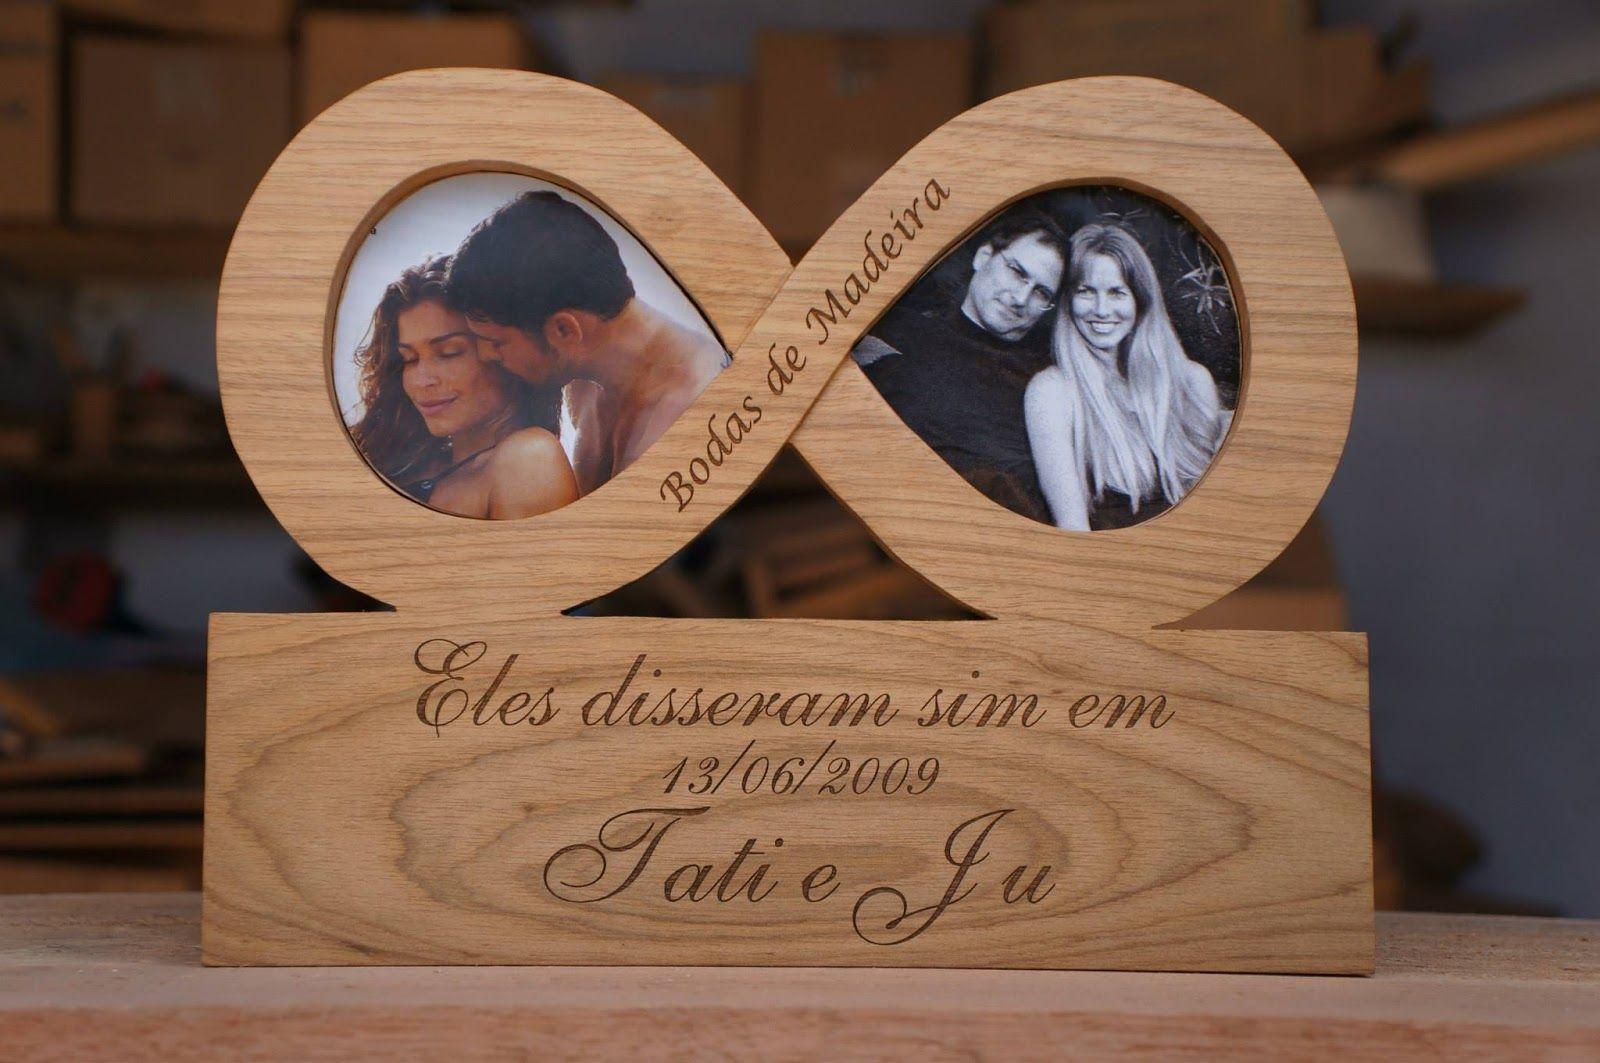 Bodas De Madeira Placa 5 Anos De Casados Aniversario Casamento